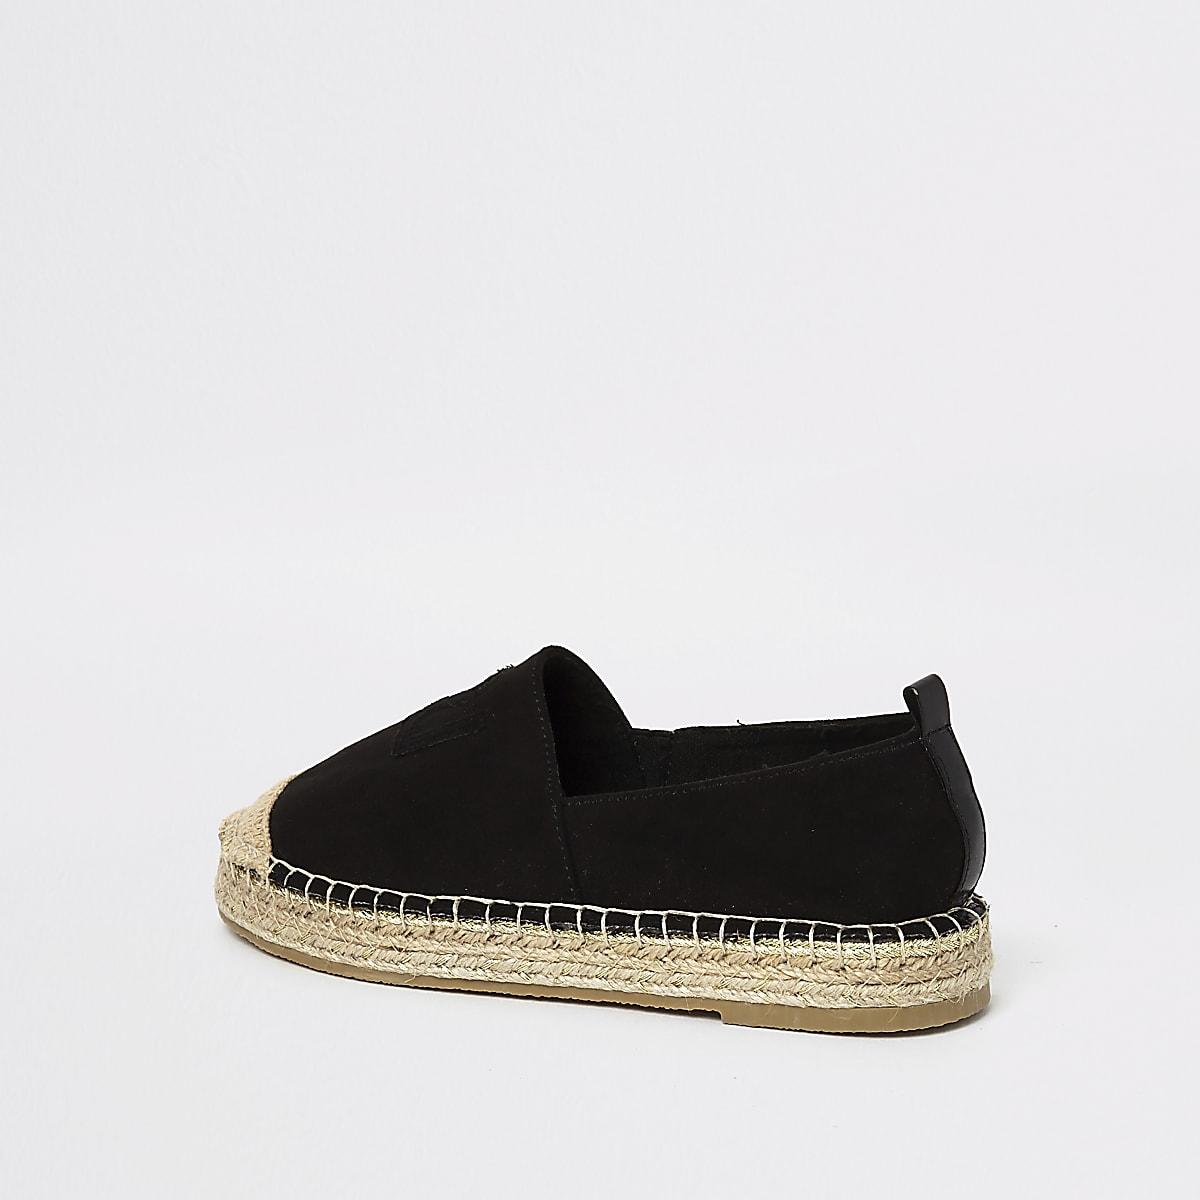 fc3a22cb02bf Girls black glitter espadrille plimsolls - Shoes - Footwear - girls